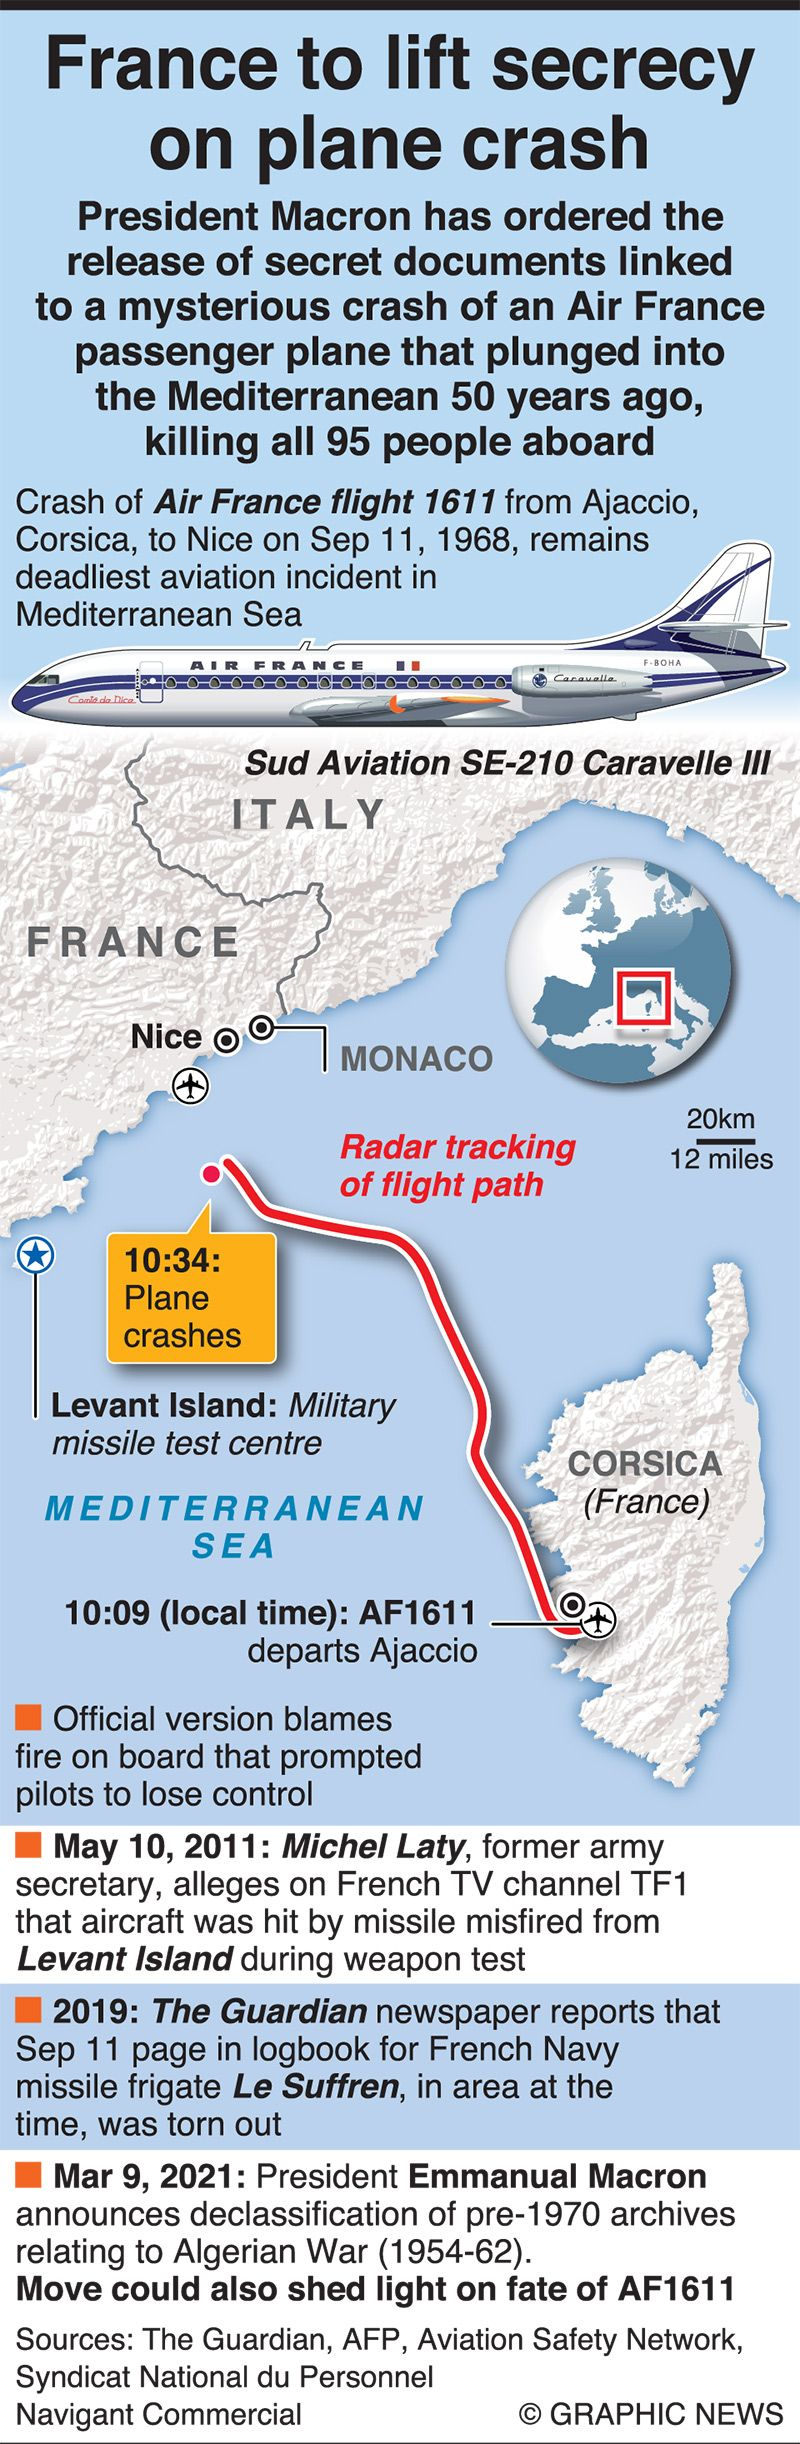 France to lift secresy on plance crash